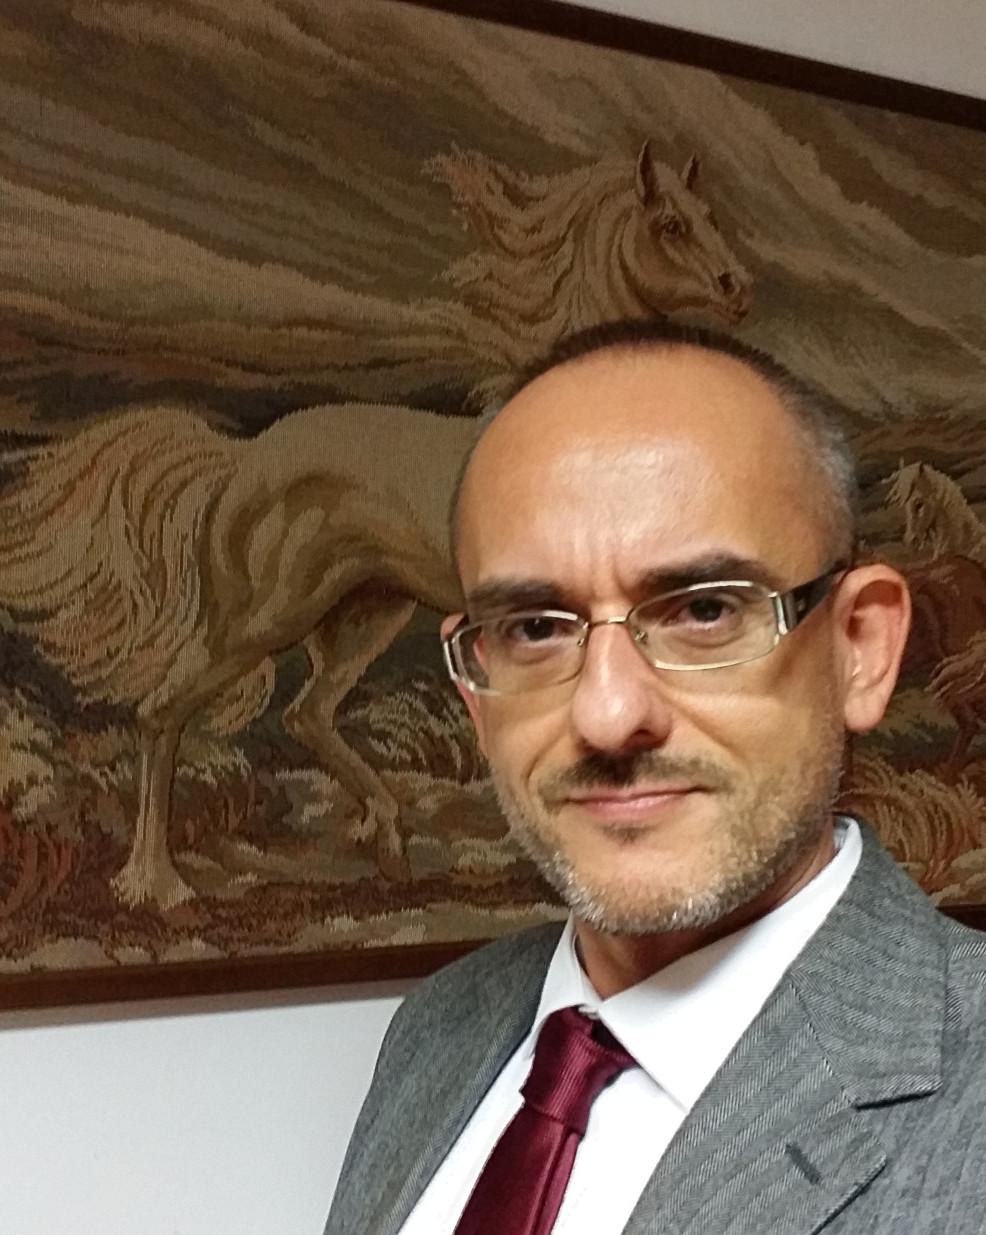 Avvocato Giuseppe Briganti